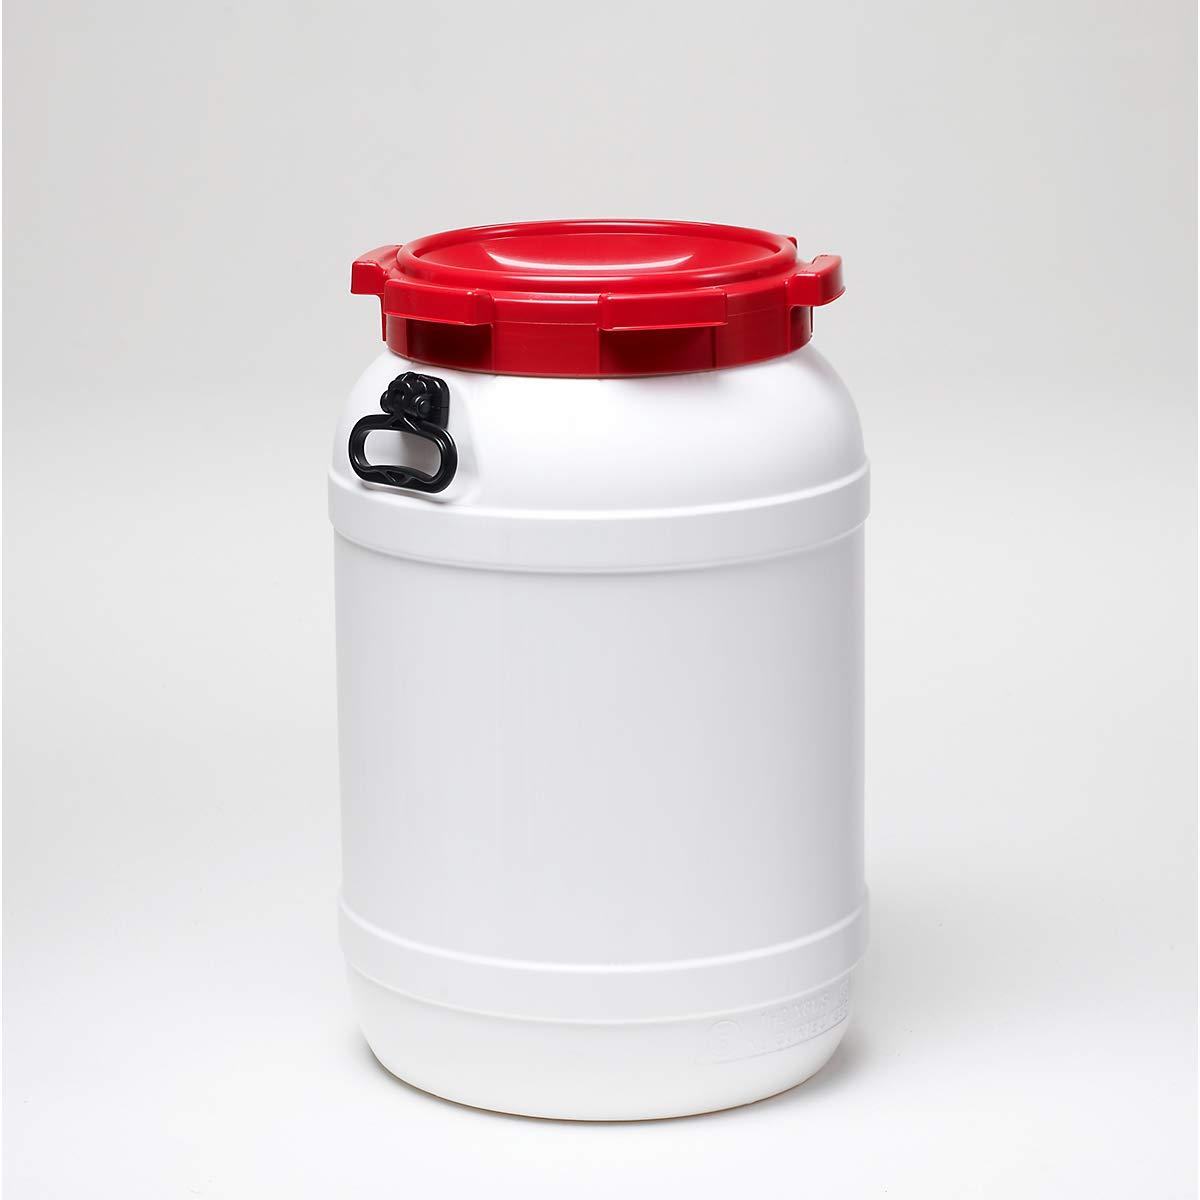 Certeo Weithalsfass 68l - Inhalt 68 Liter - Fass Kunststofffass Rundfass Standfass Weithalstonne Tonne